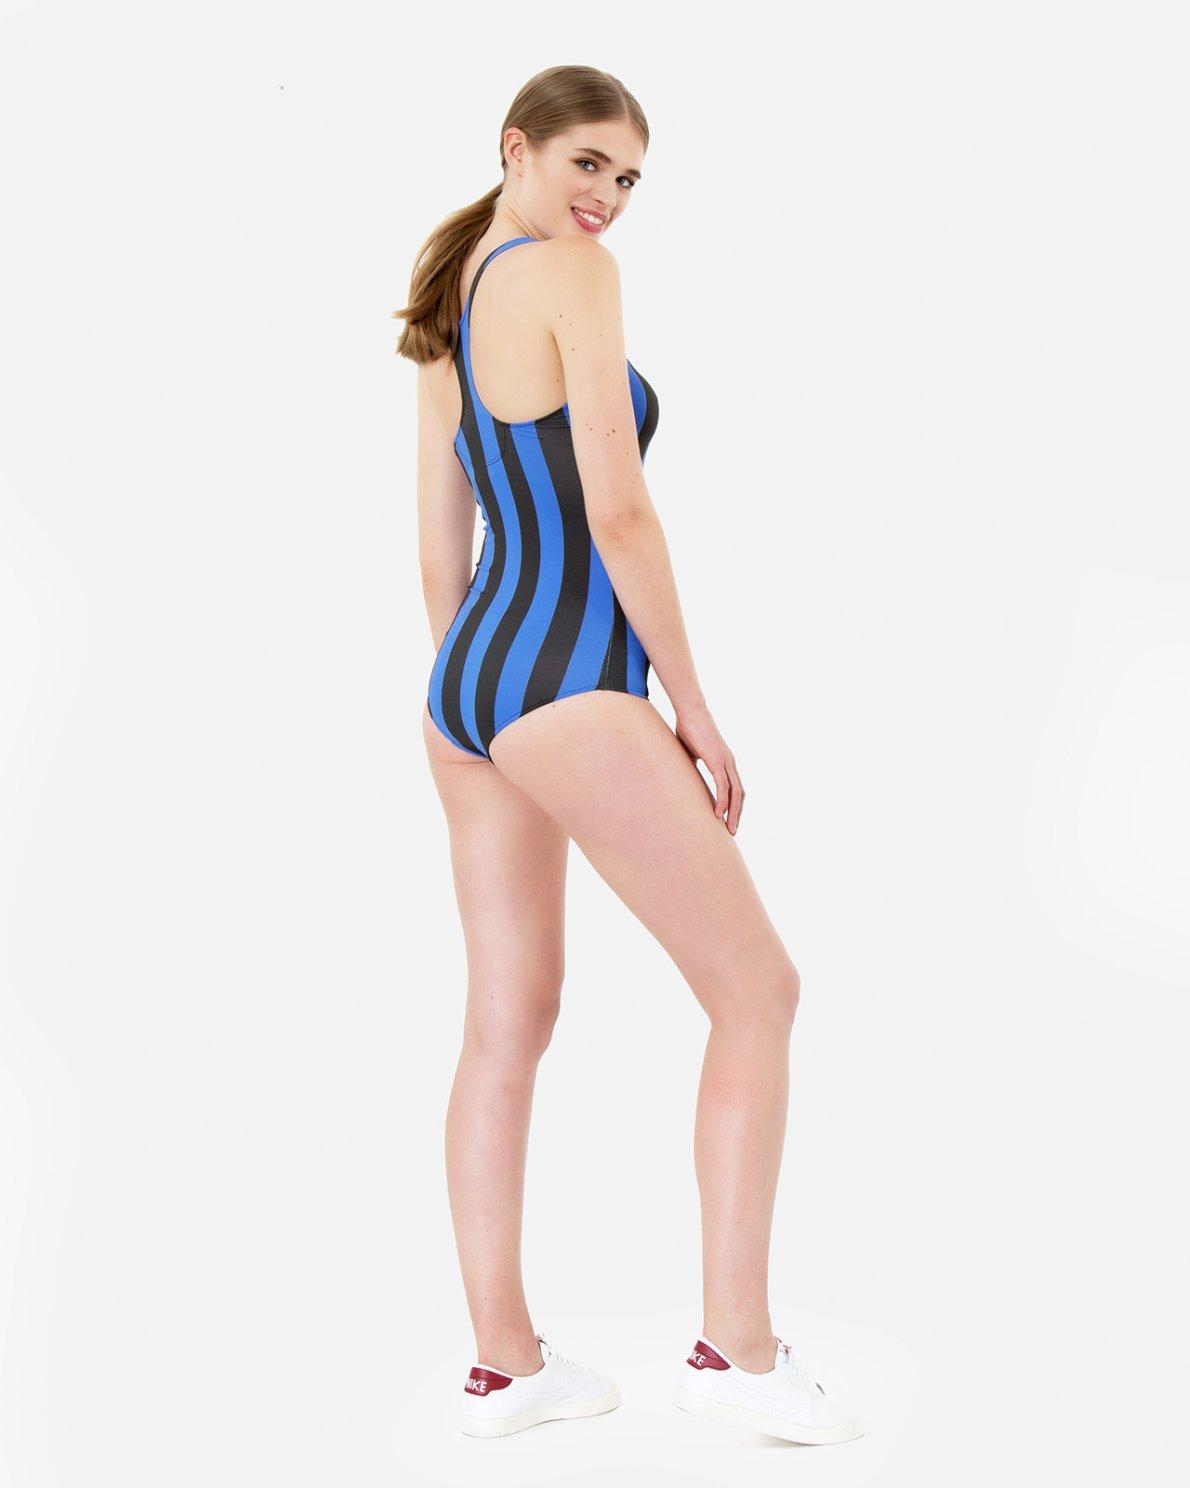 7e6ff41f576 OUTLET Clothing - Moss Copenhagen - Emmy Mai Striped Bodystocking